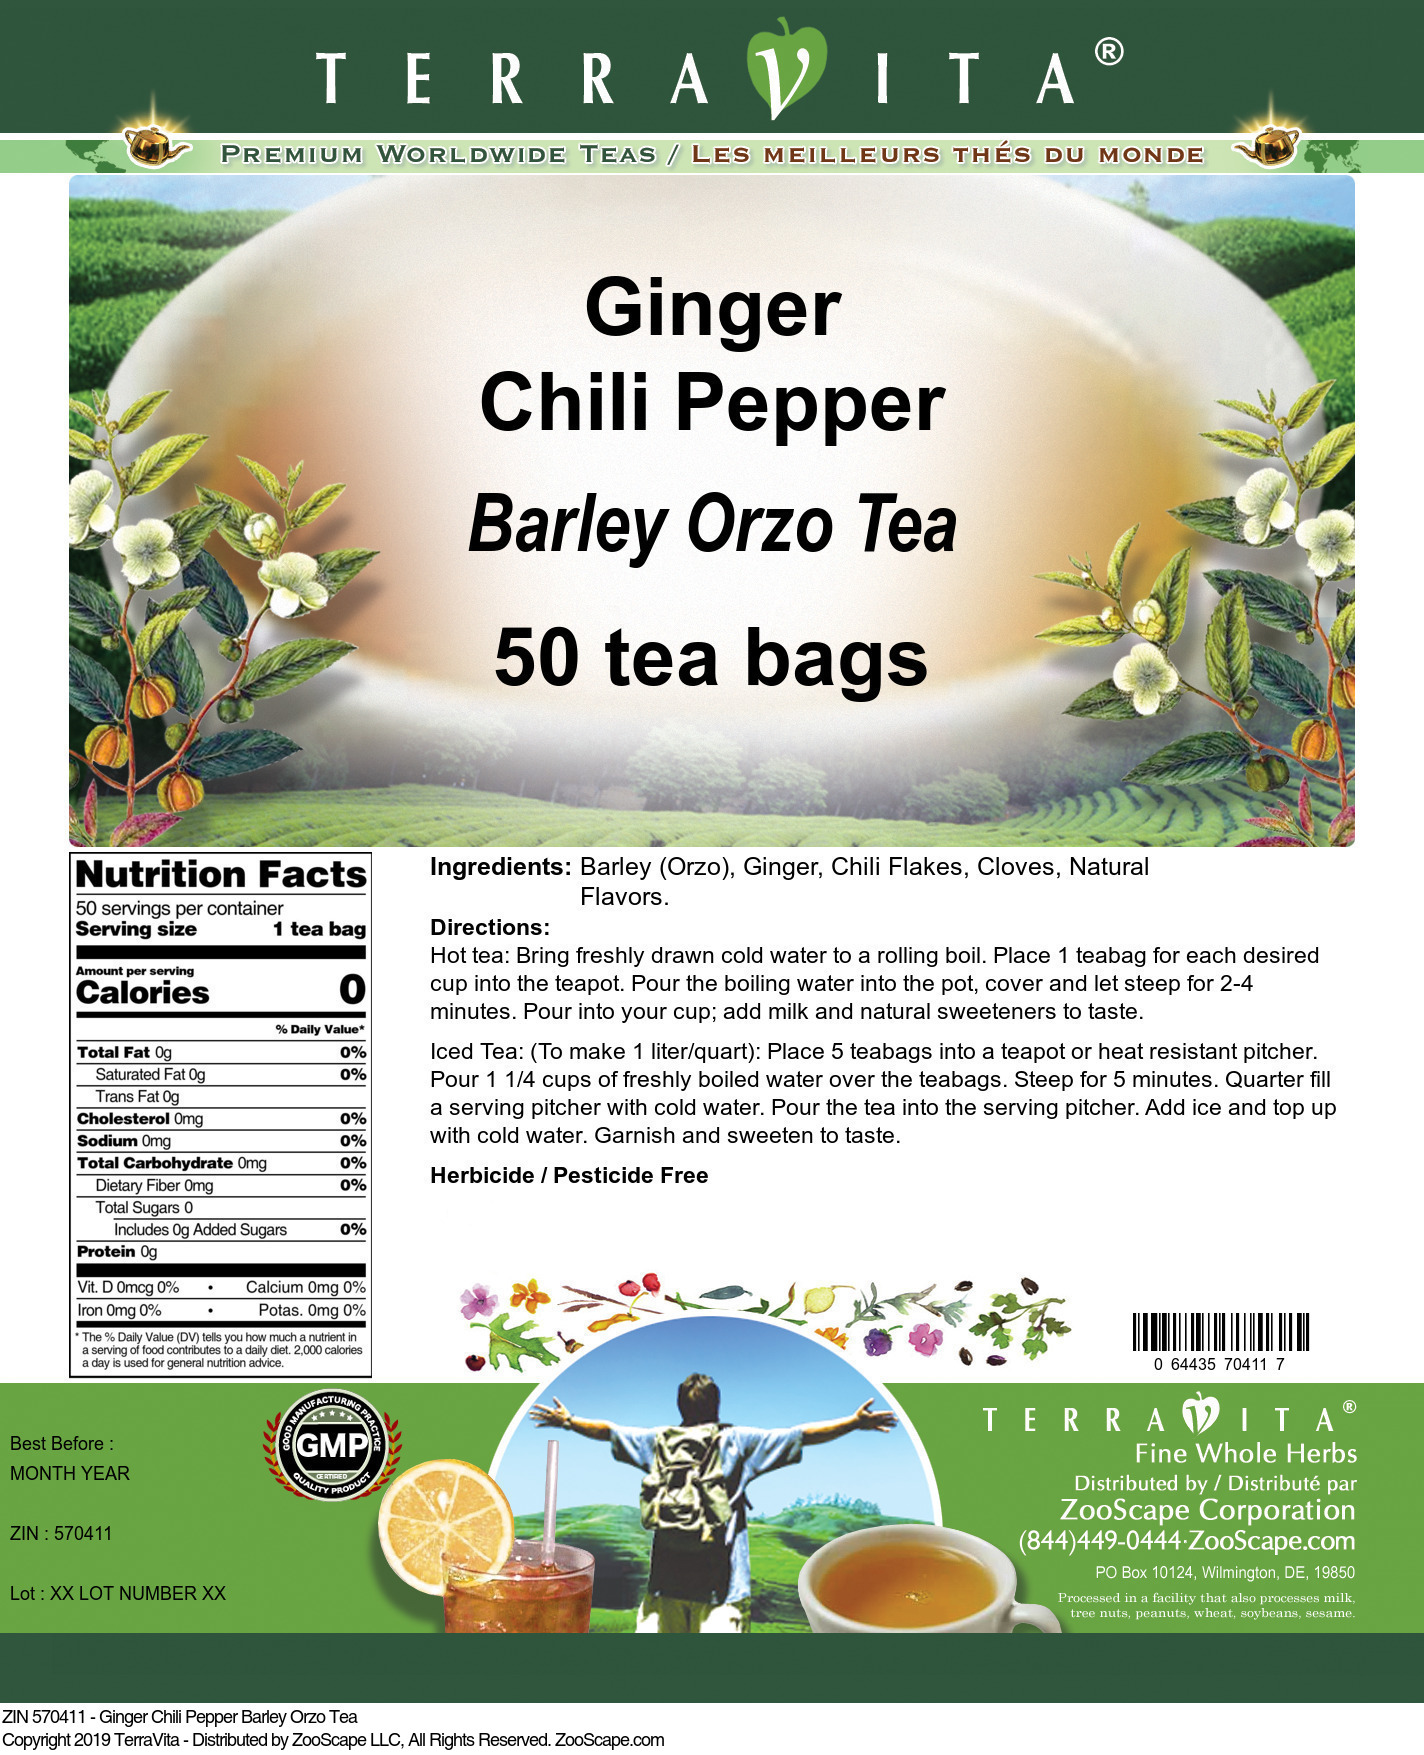 Ginger Chili Pepper Barley Orzo